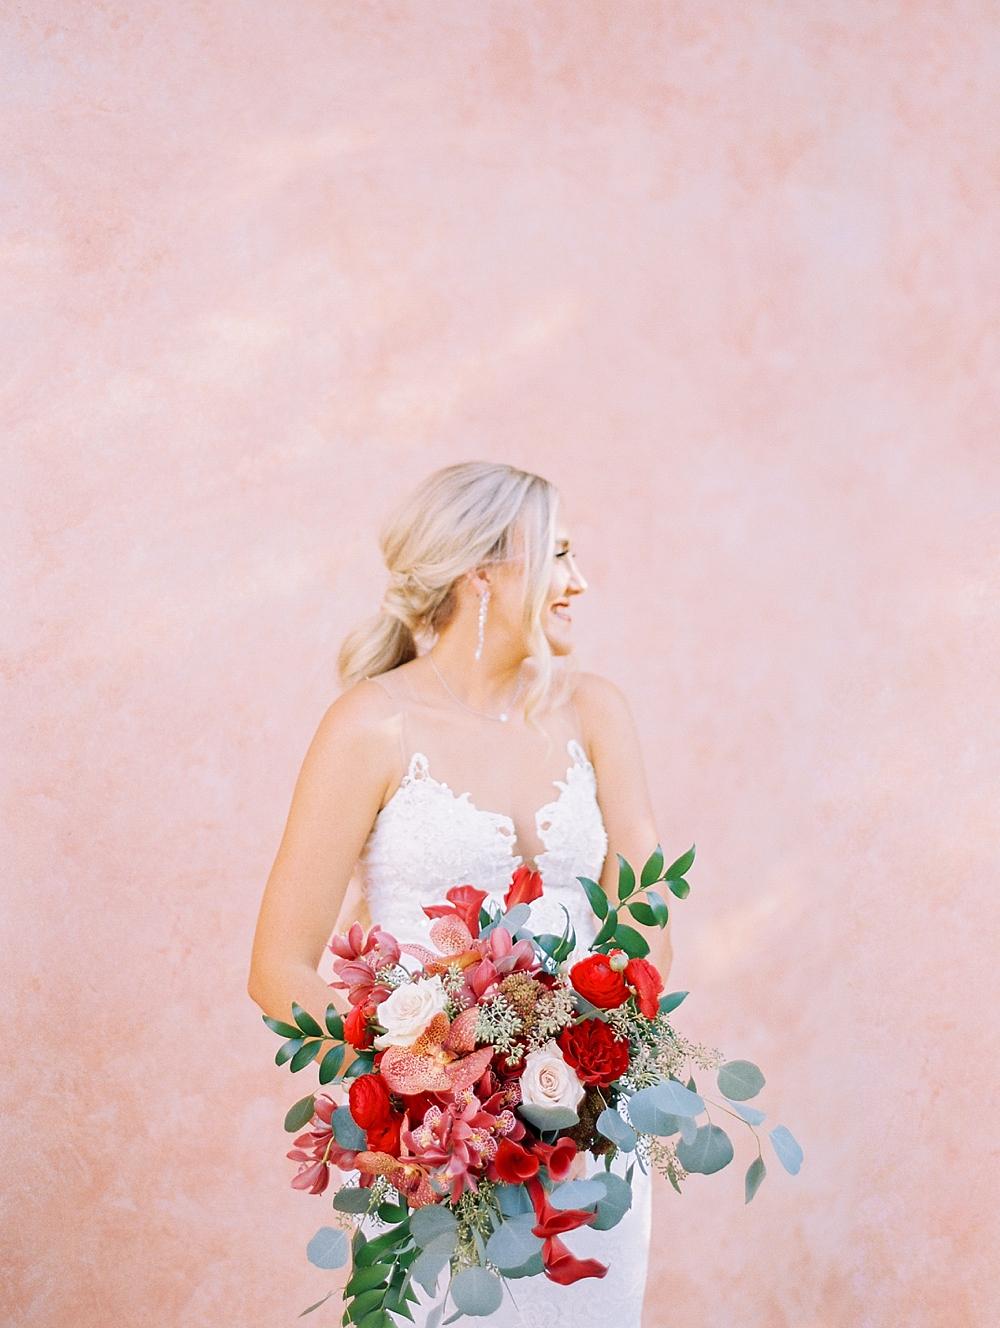 kristin-la-voie-photography-AUSTIN-WEDDING-PHOTOGRAPHER-BEST-IN-TEXAS-9